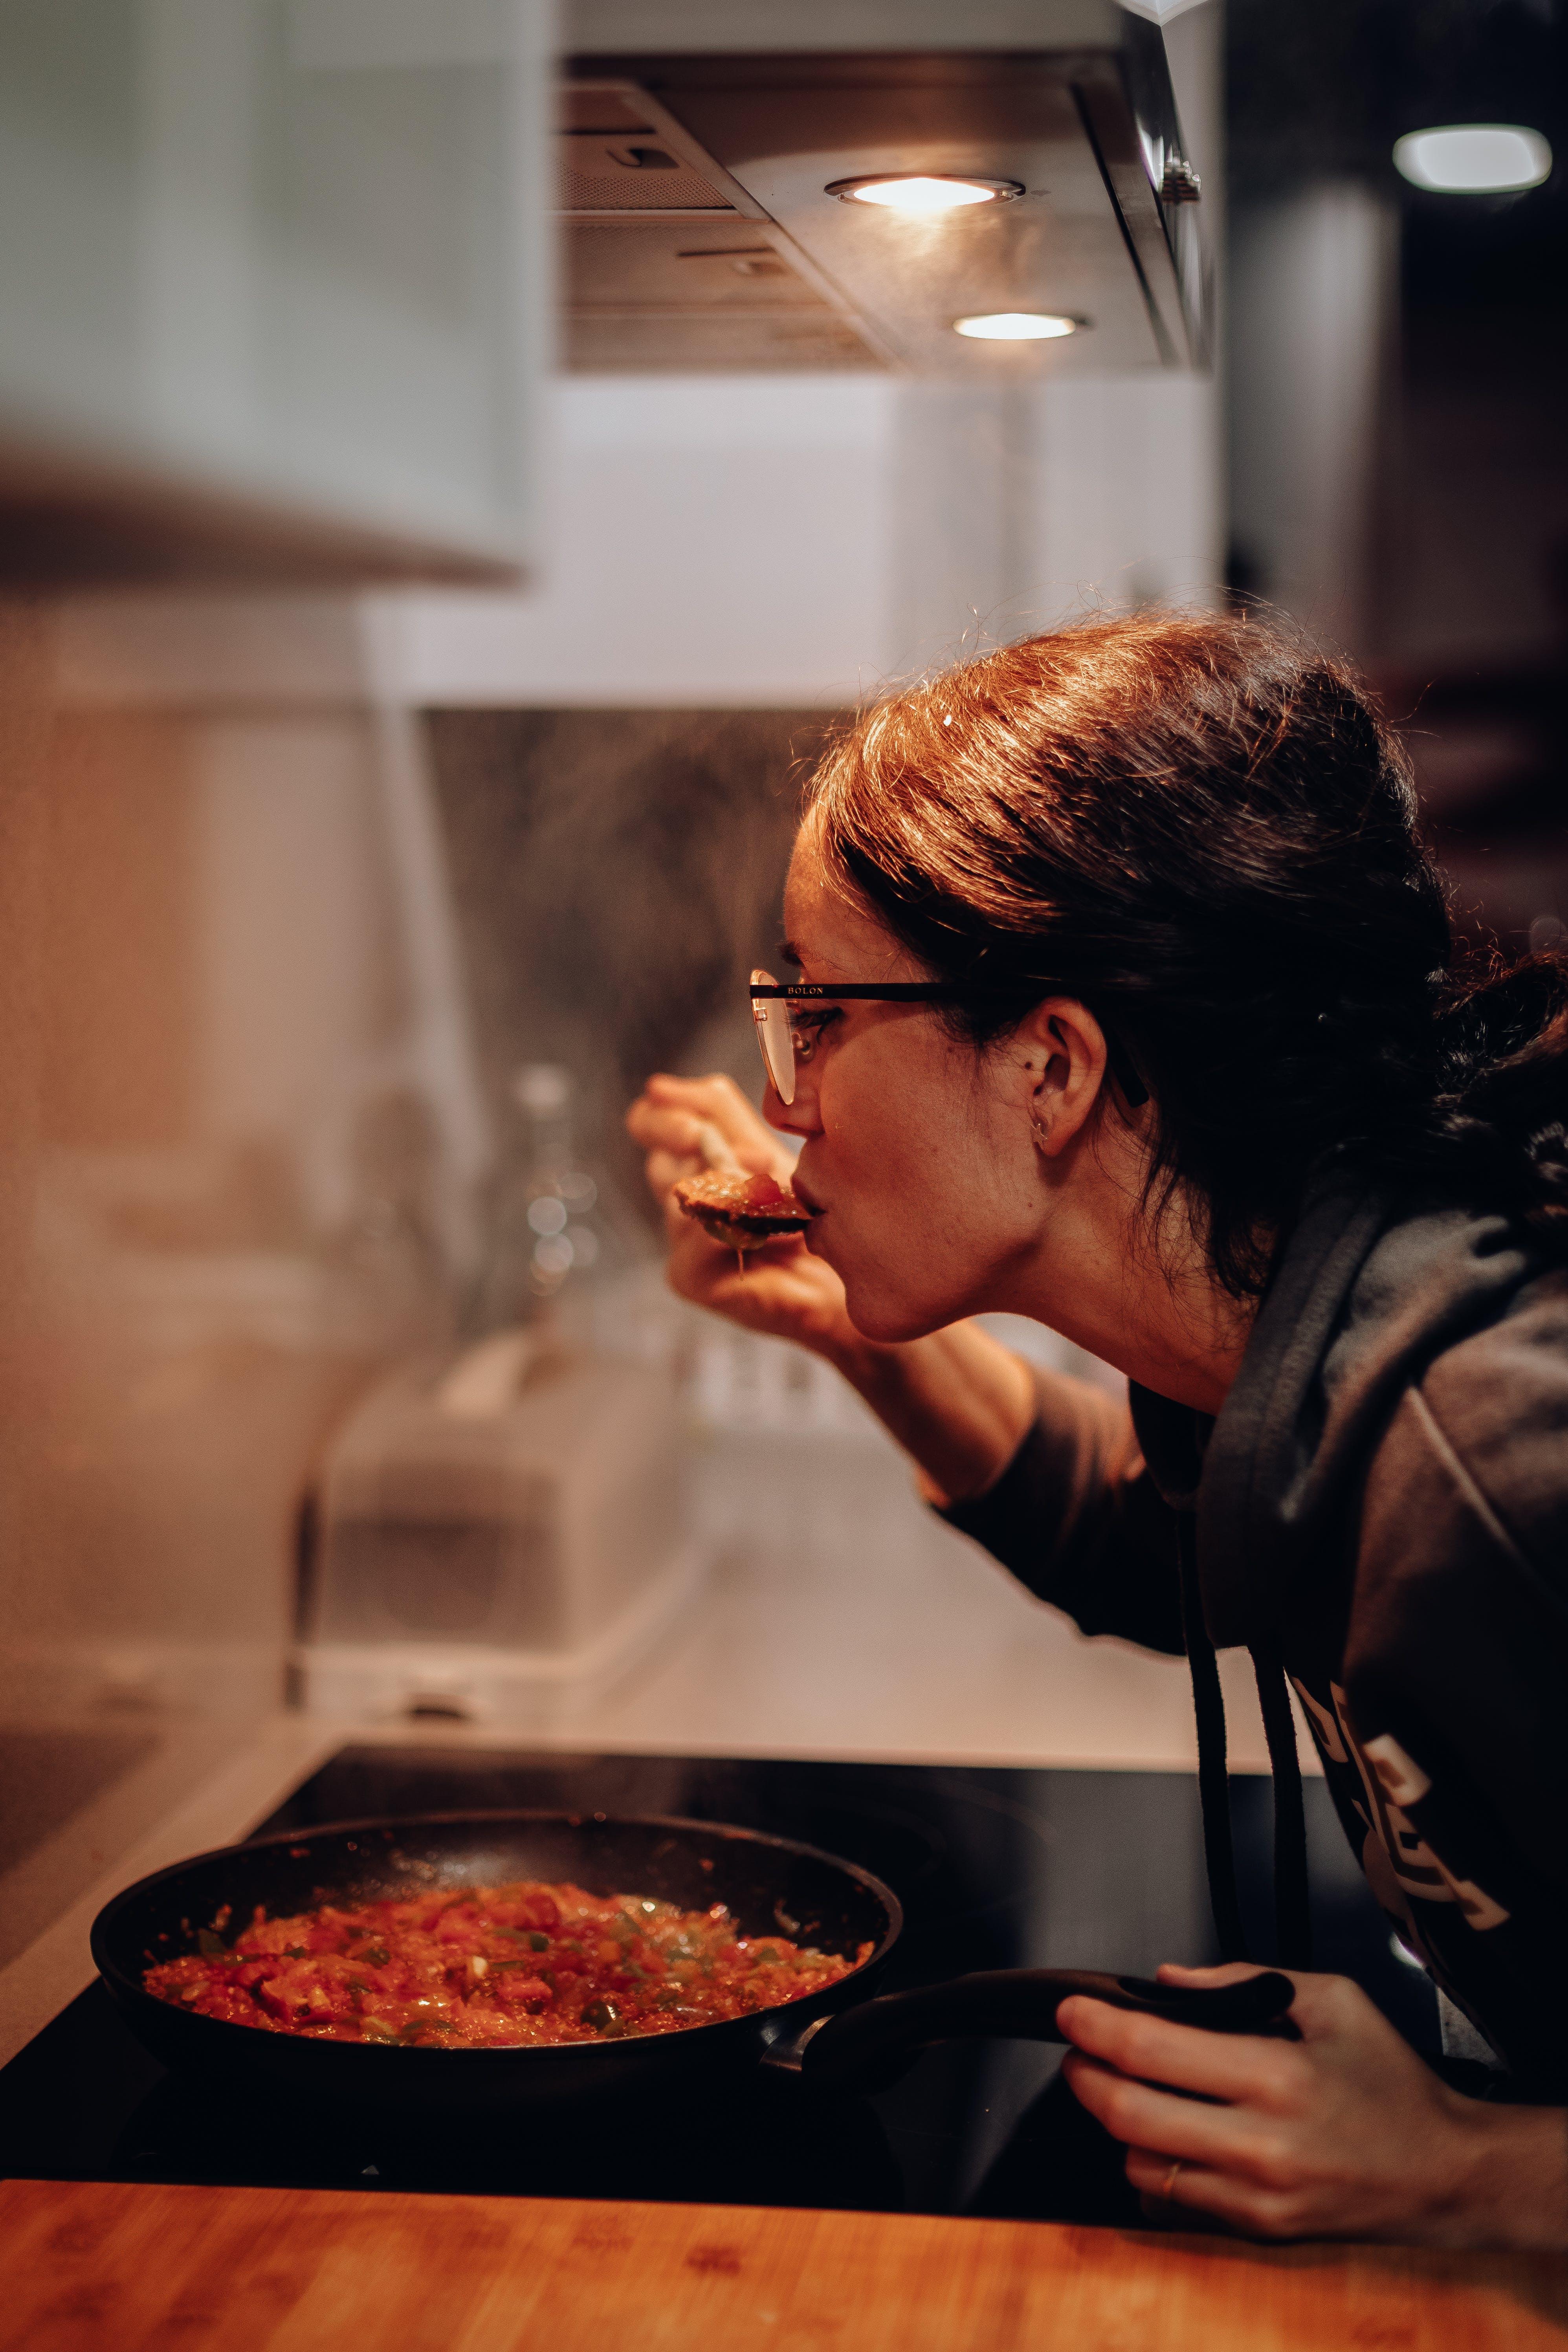 Woman Eating on Cooking Pan